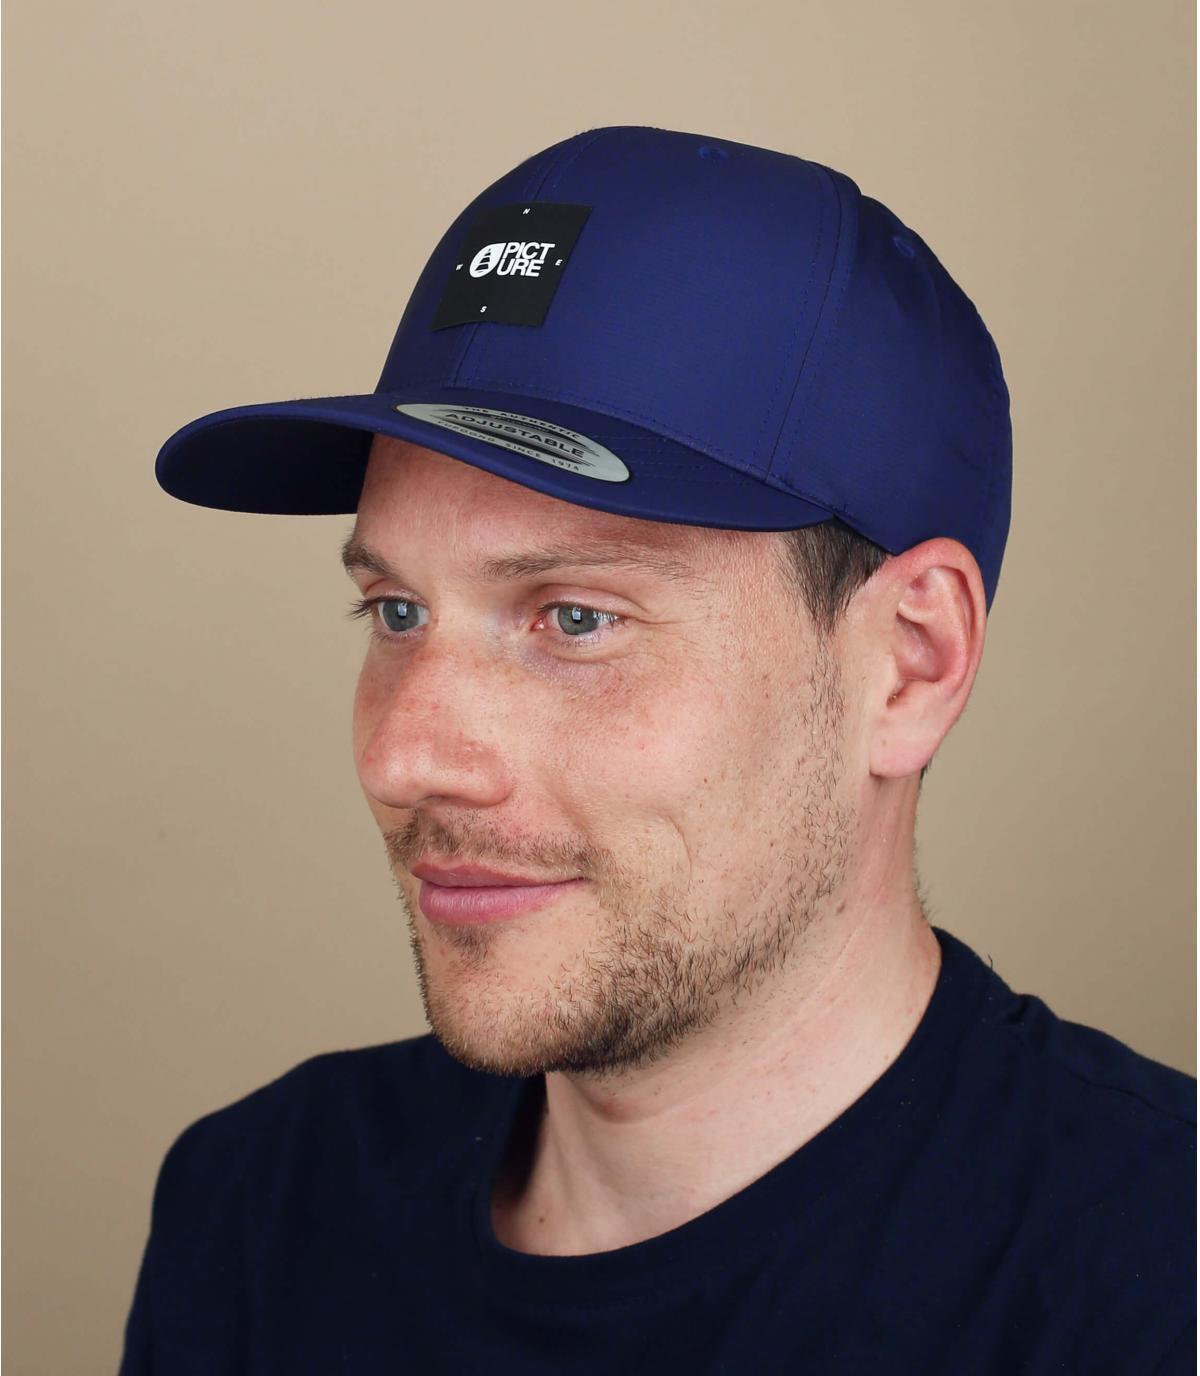 Gorra Picture azul marino